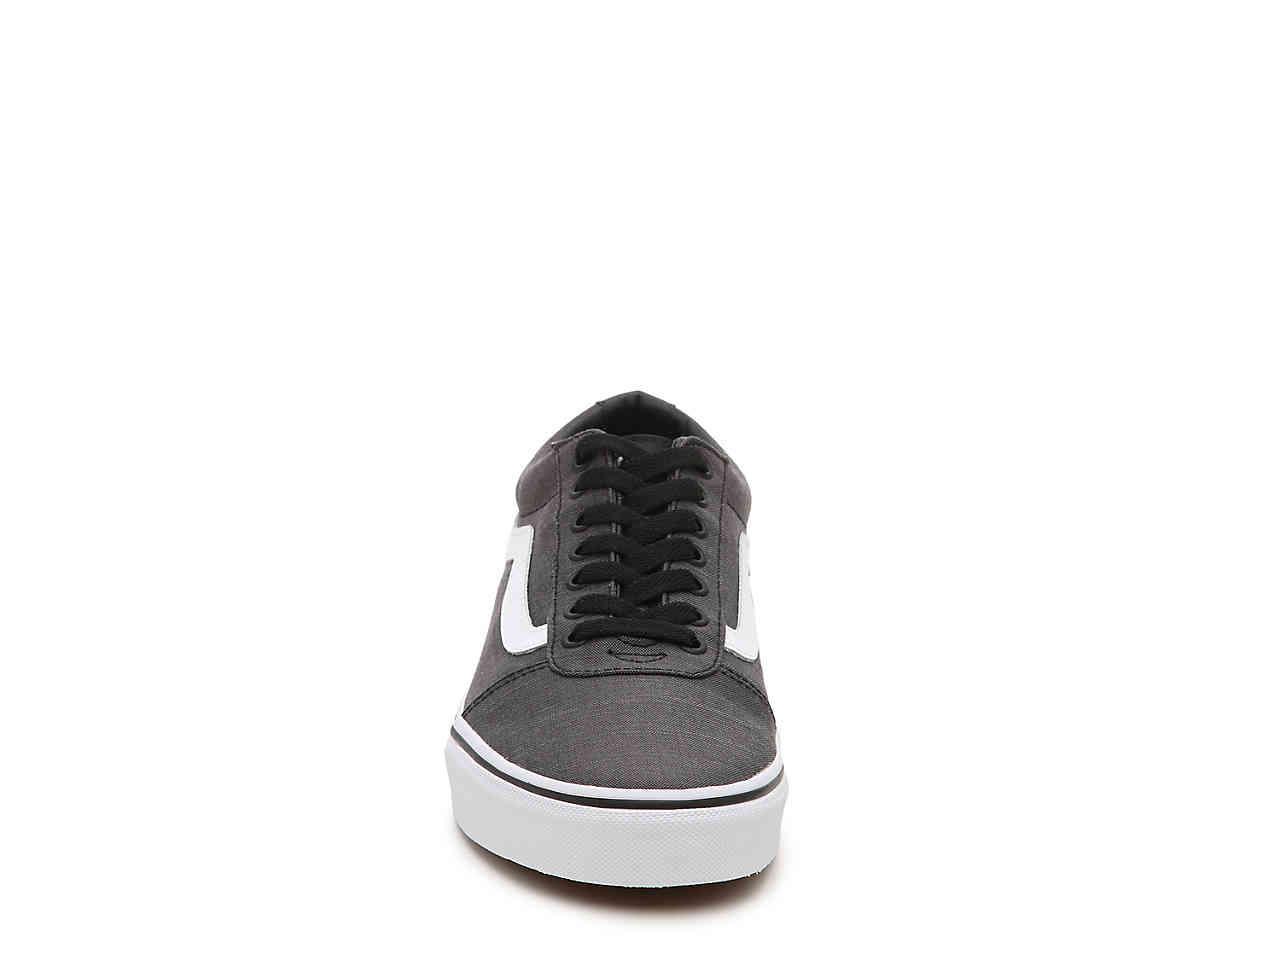 c34dc4b05cfd8c Lyst - Vans Ward Sneaker in Black for Men